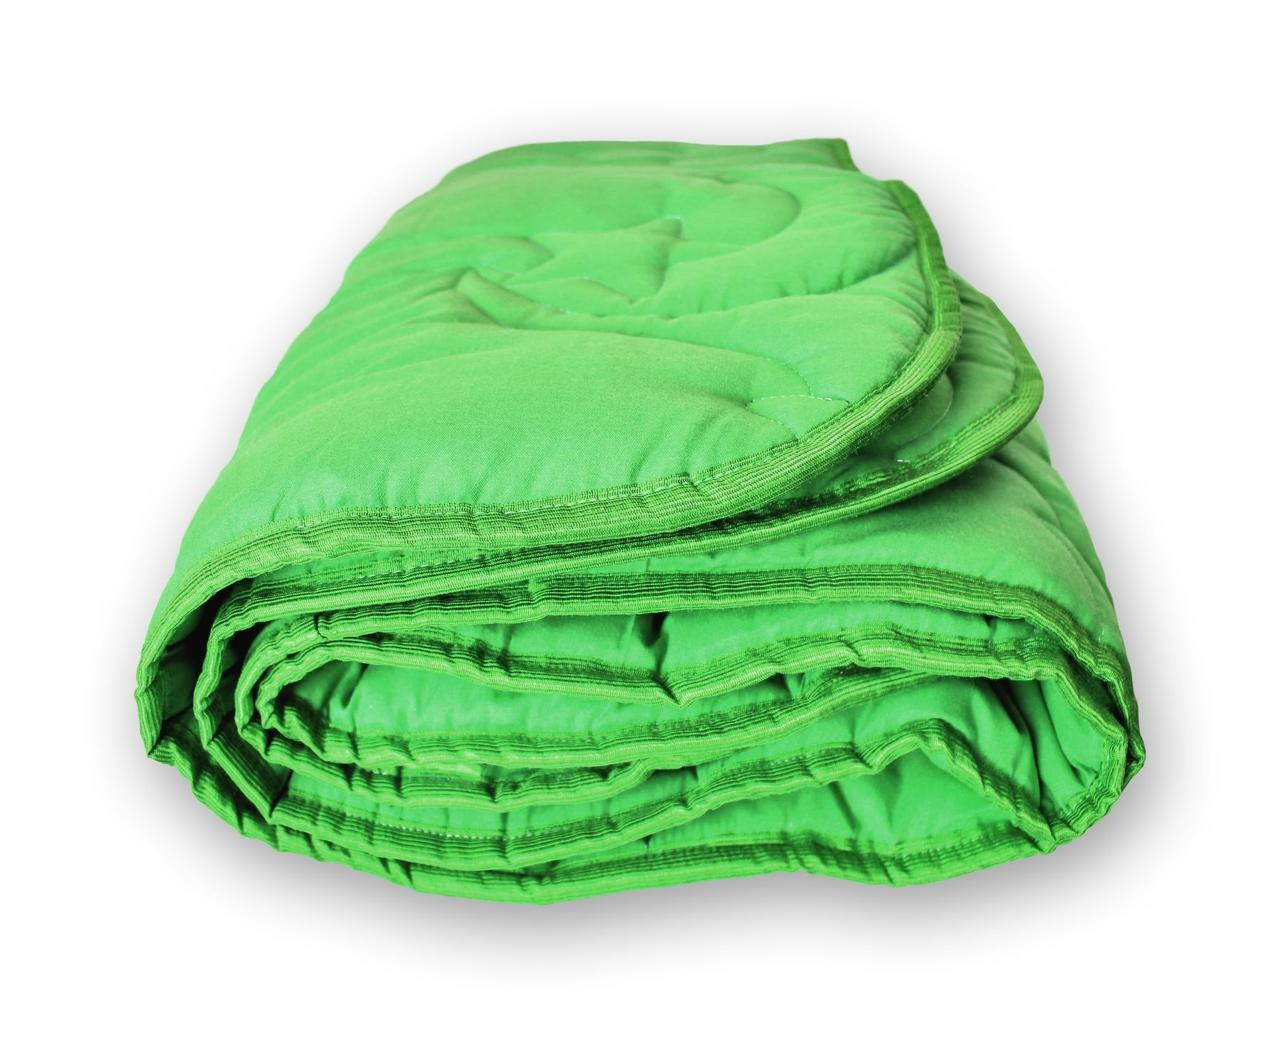 Одеяло полуторное QSLEEP теплое 140*205 см зеленое